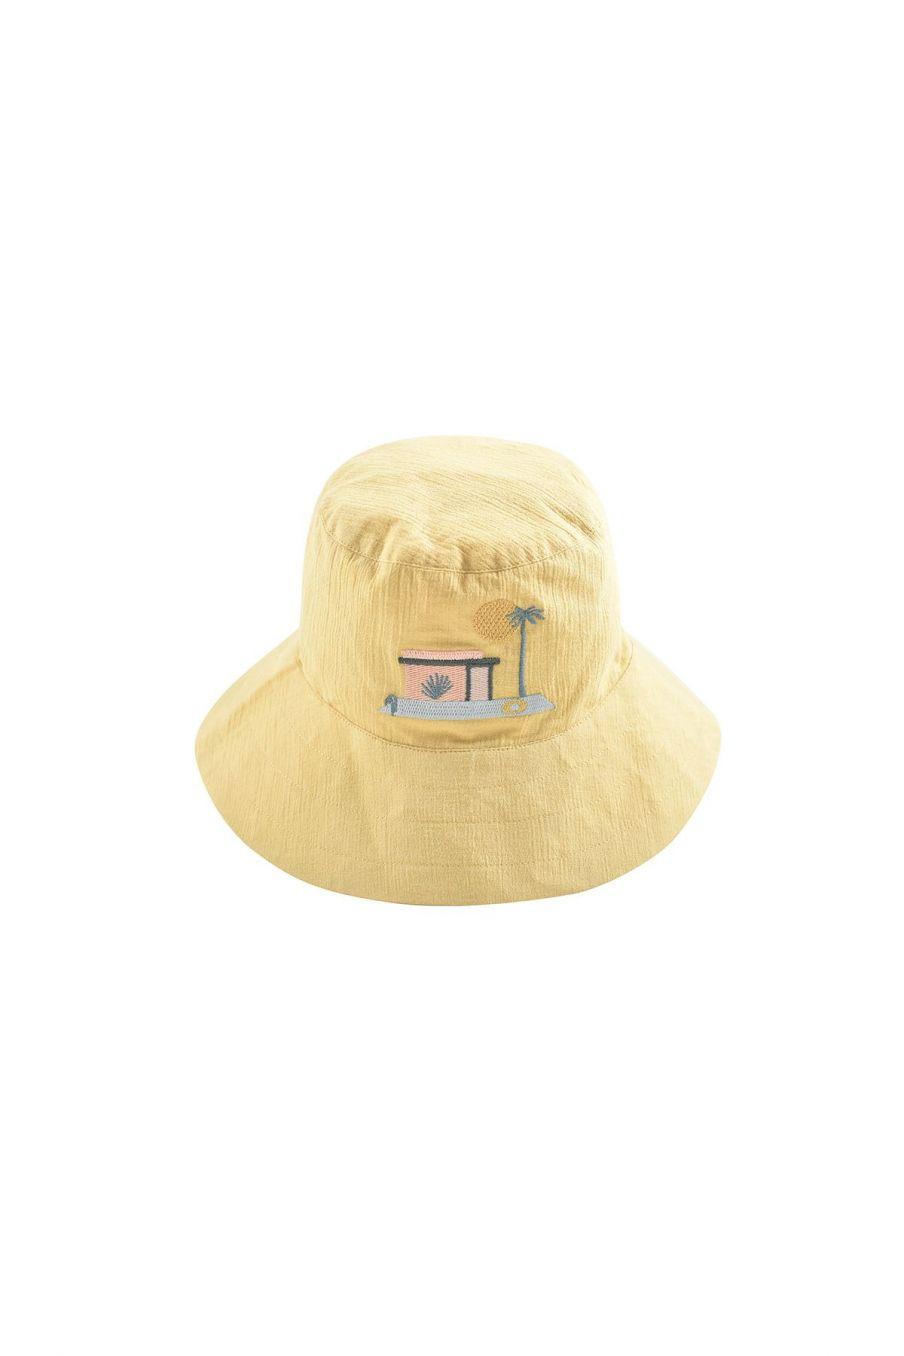 boheme chic vintage chapeau garcon afir soft honey & off-white hawaï